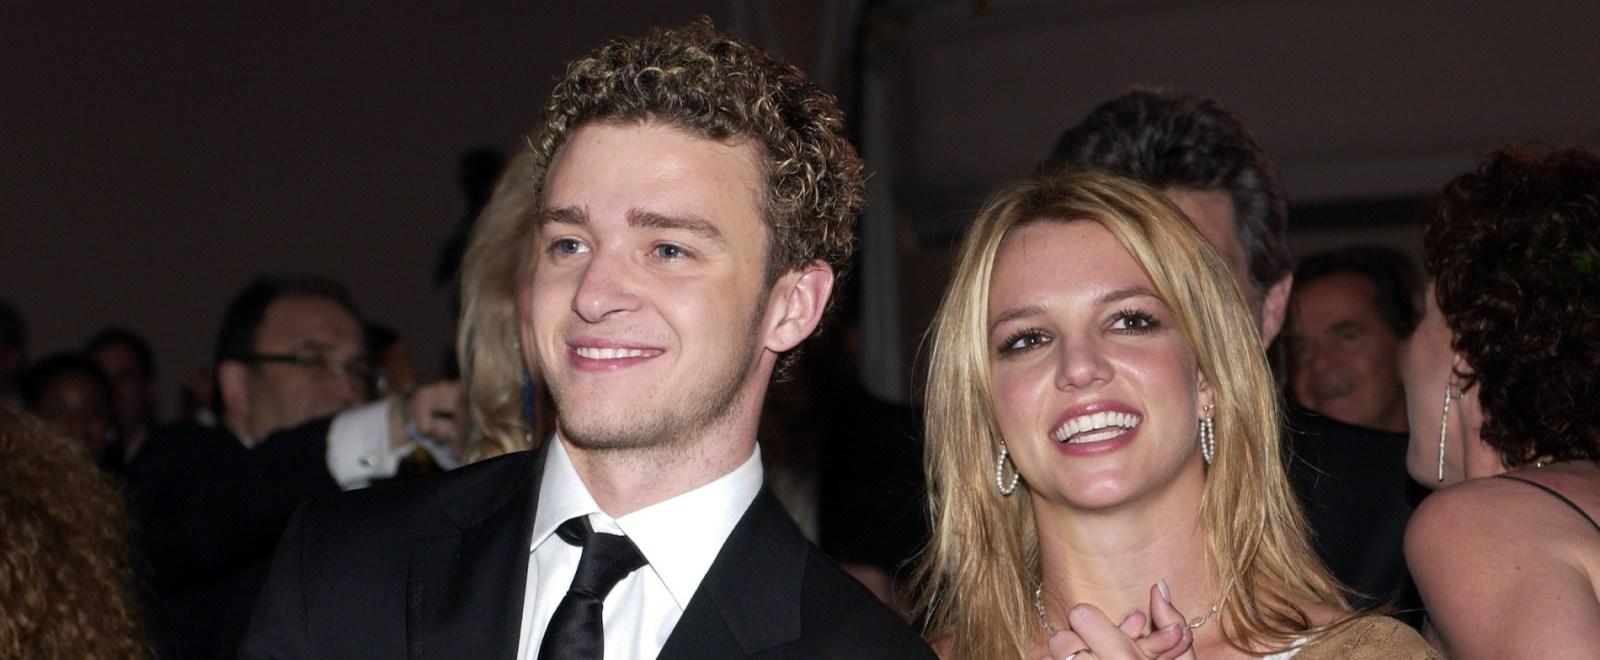 Britney Spears Addressed Her Justin Timberlake Break Up He Responded